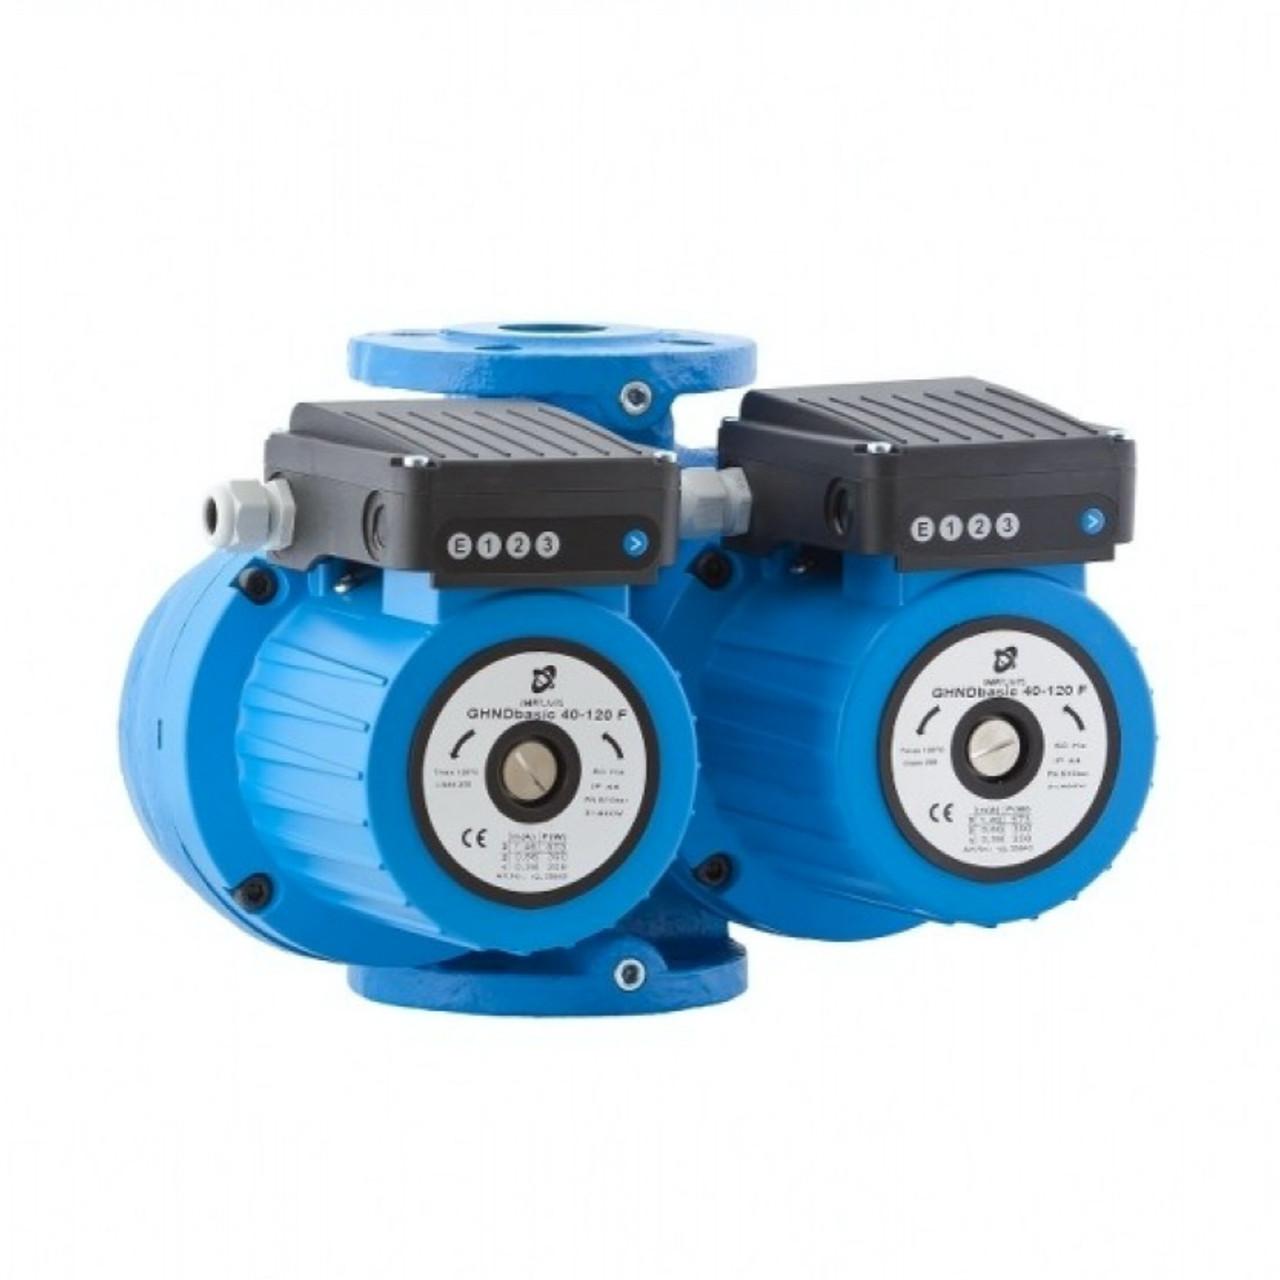 Циркуляционный насос IMP Pumps GHNMDbasic II 40-120F